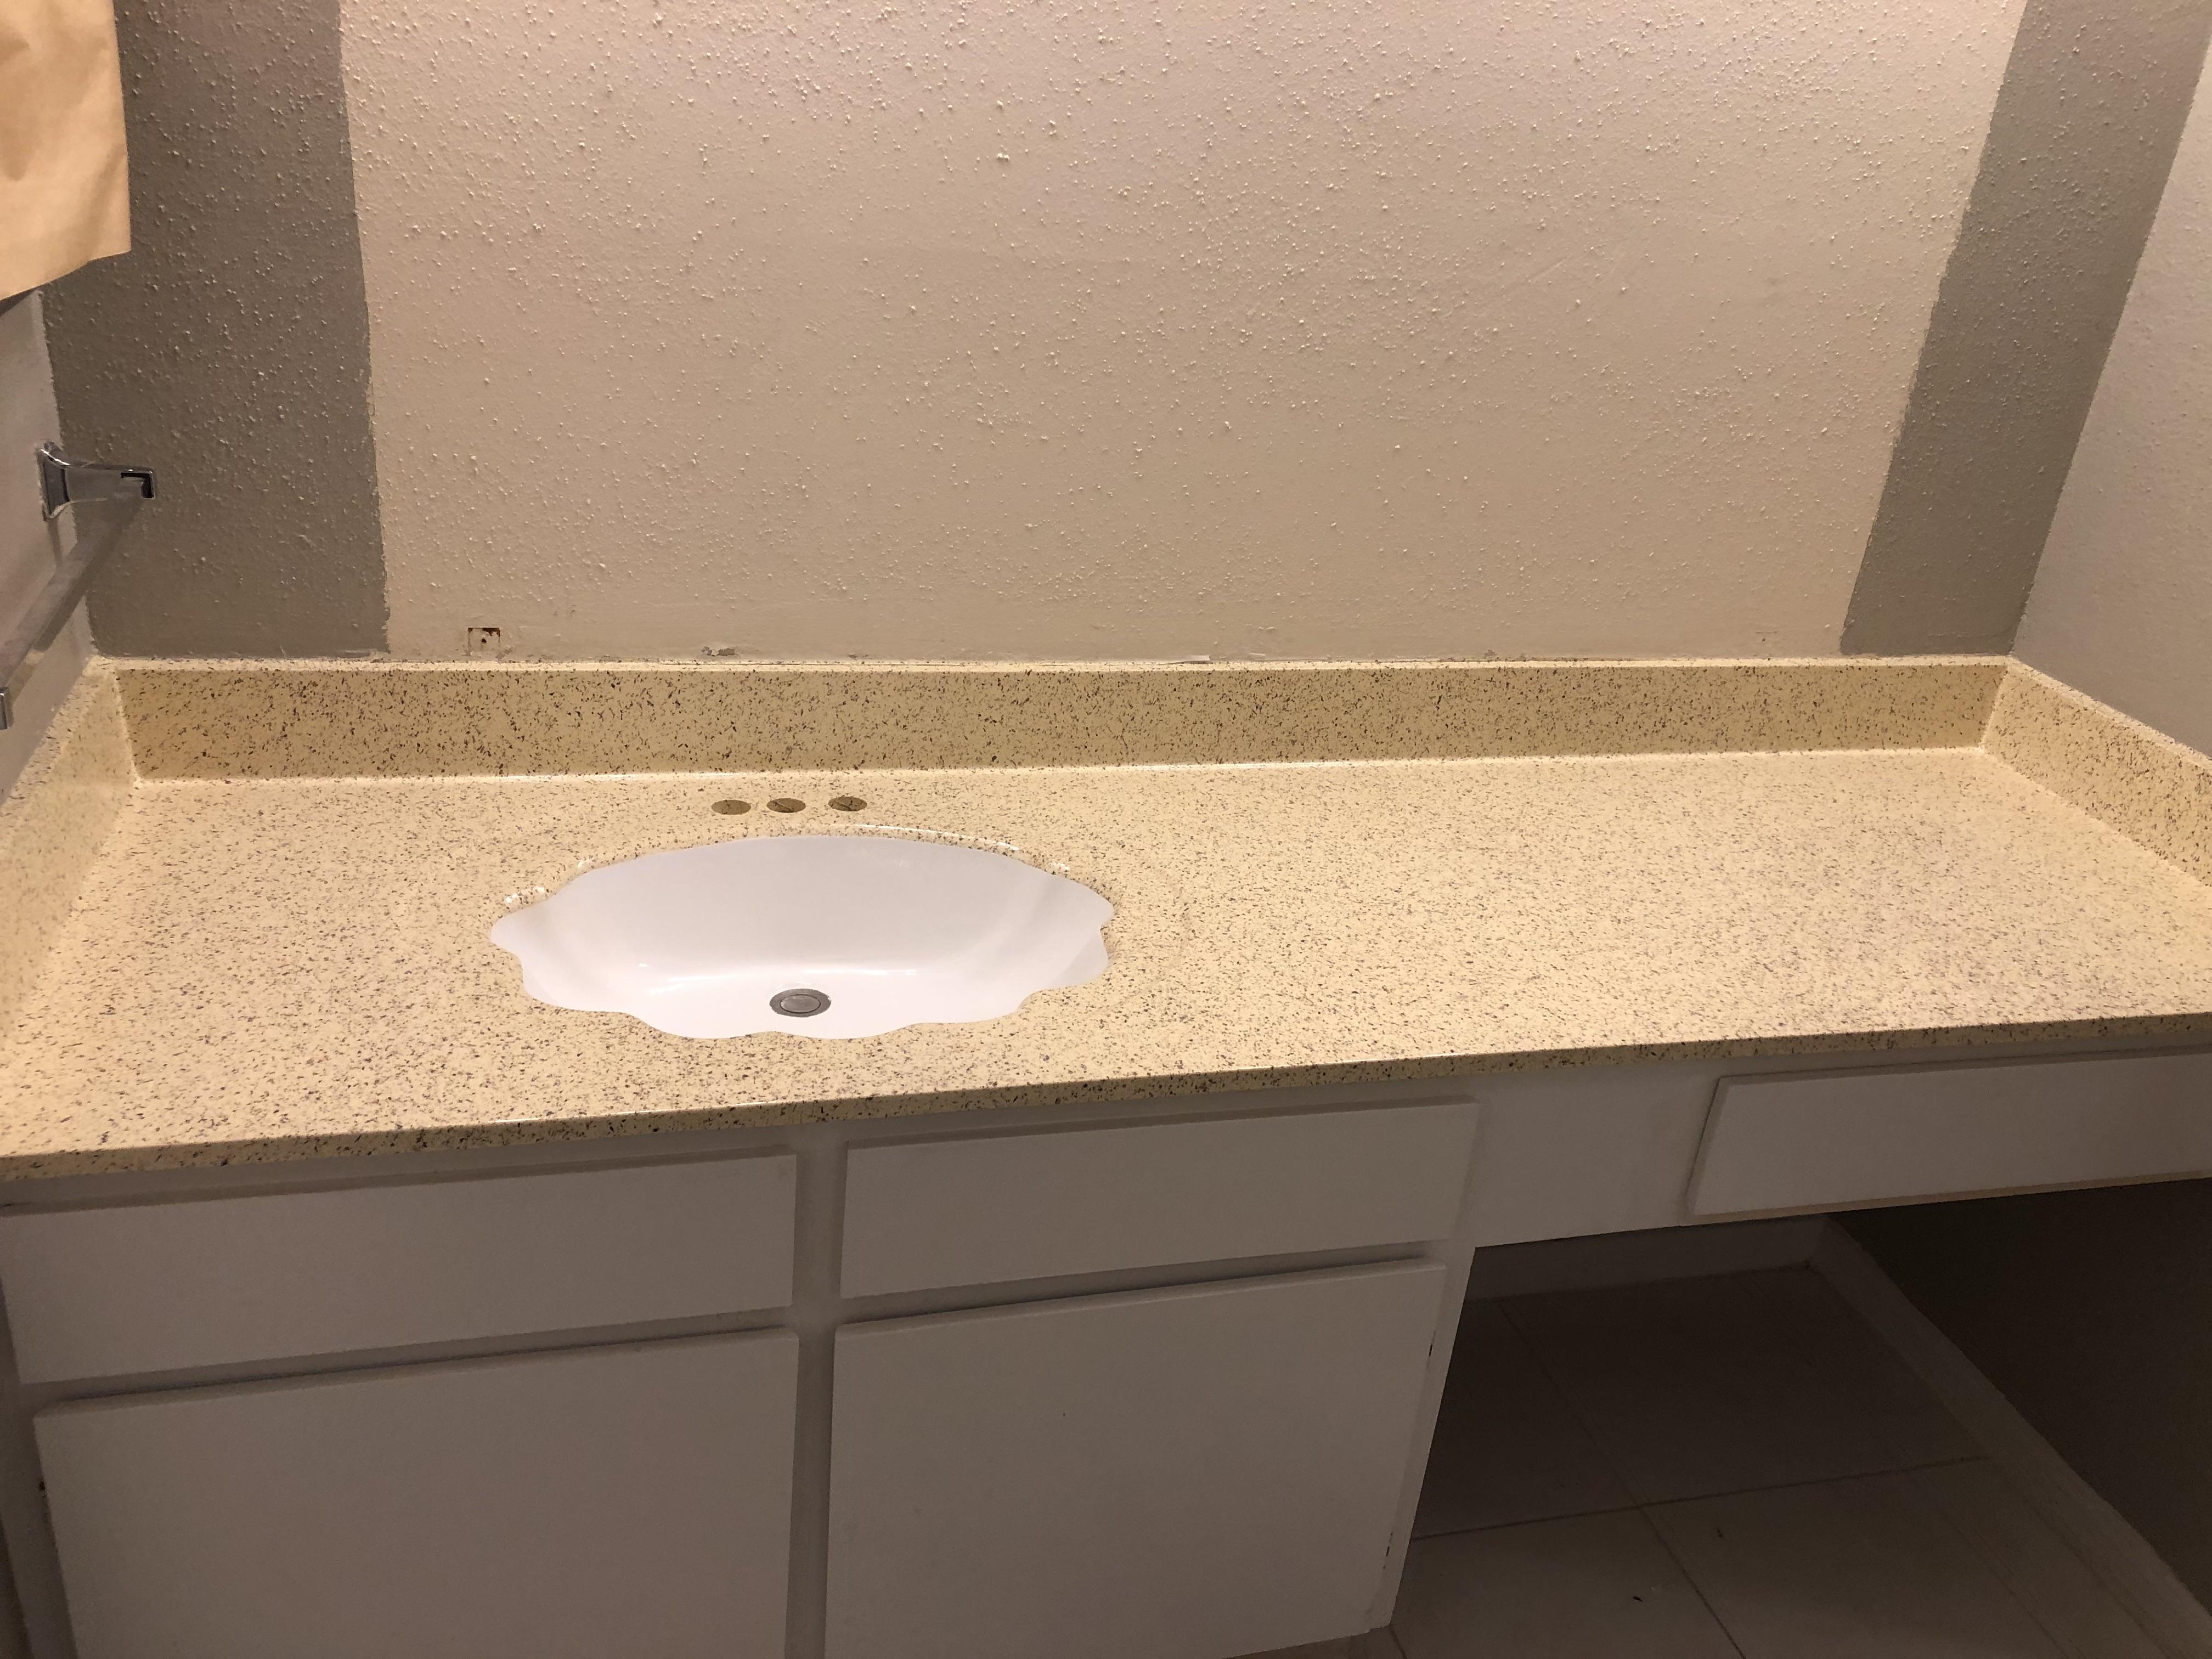 Refinish Vanity Countertop